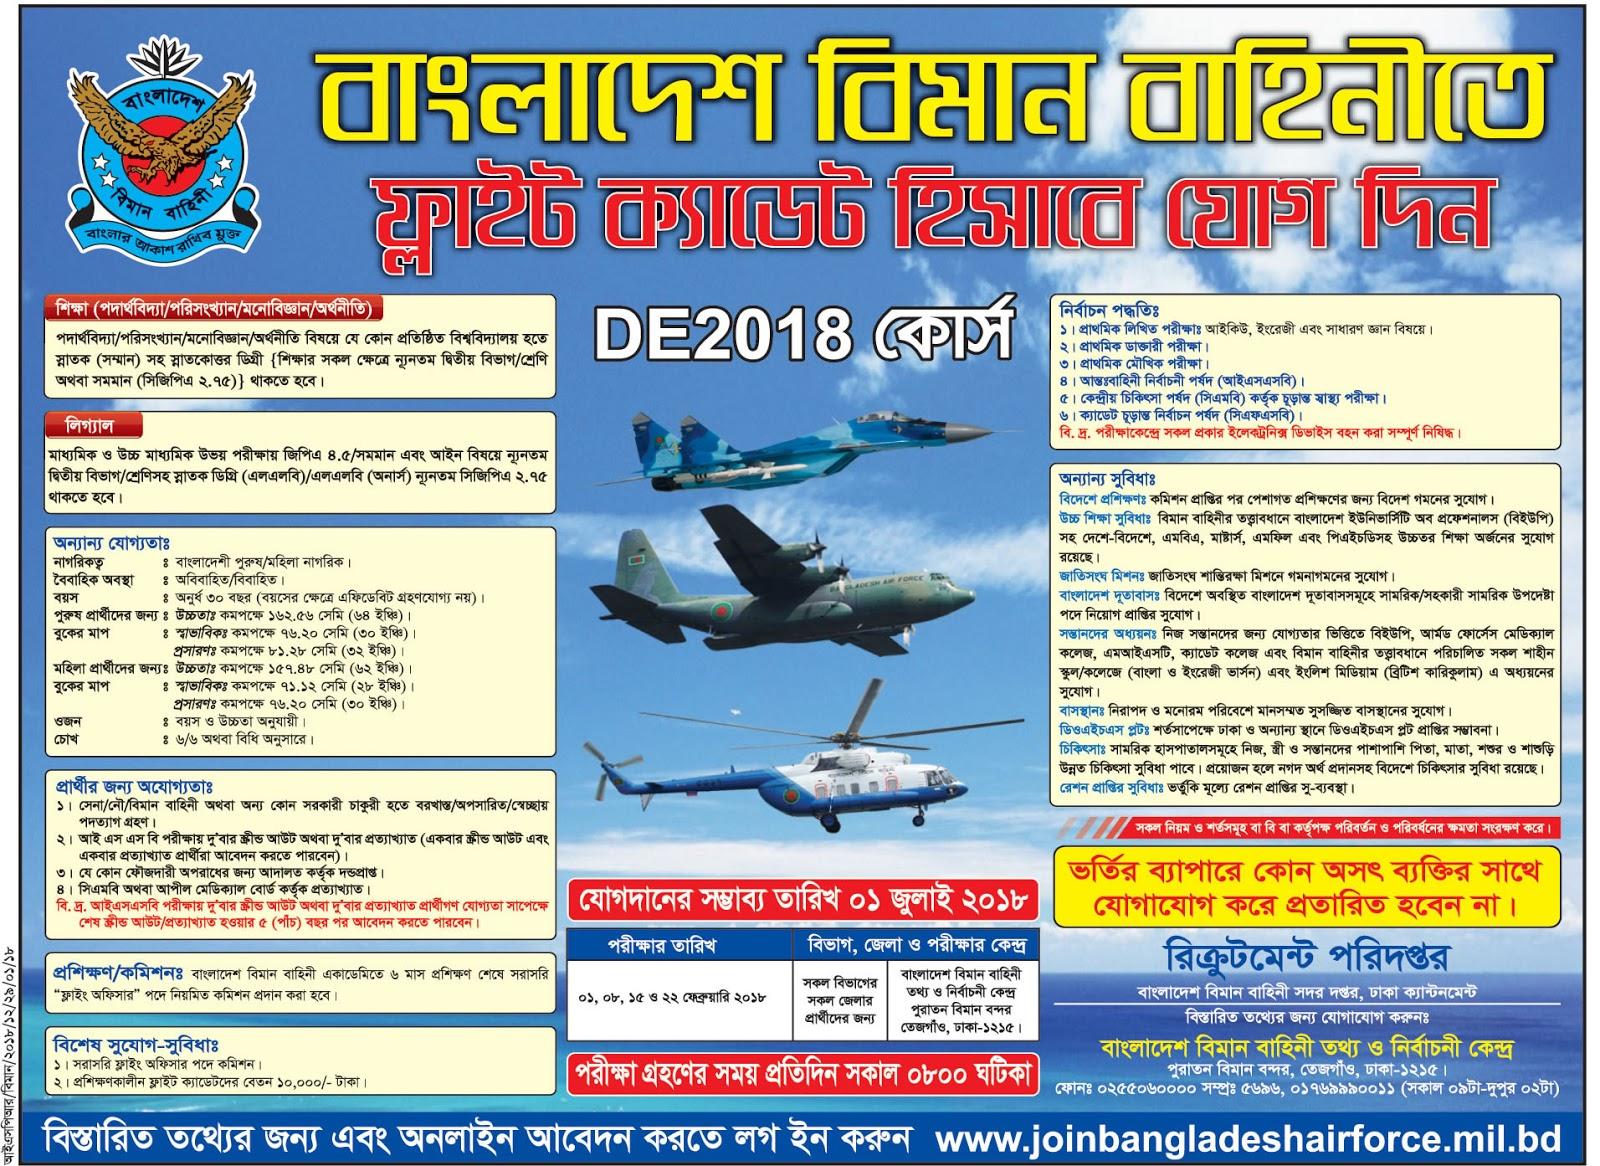 ED2018 - Bangladesh Air Force Cadet Recruitment Circular 2018